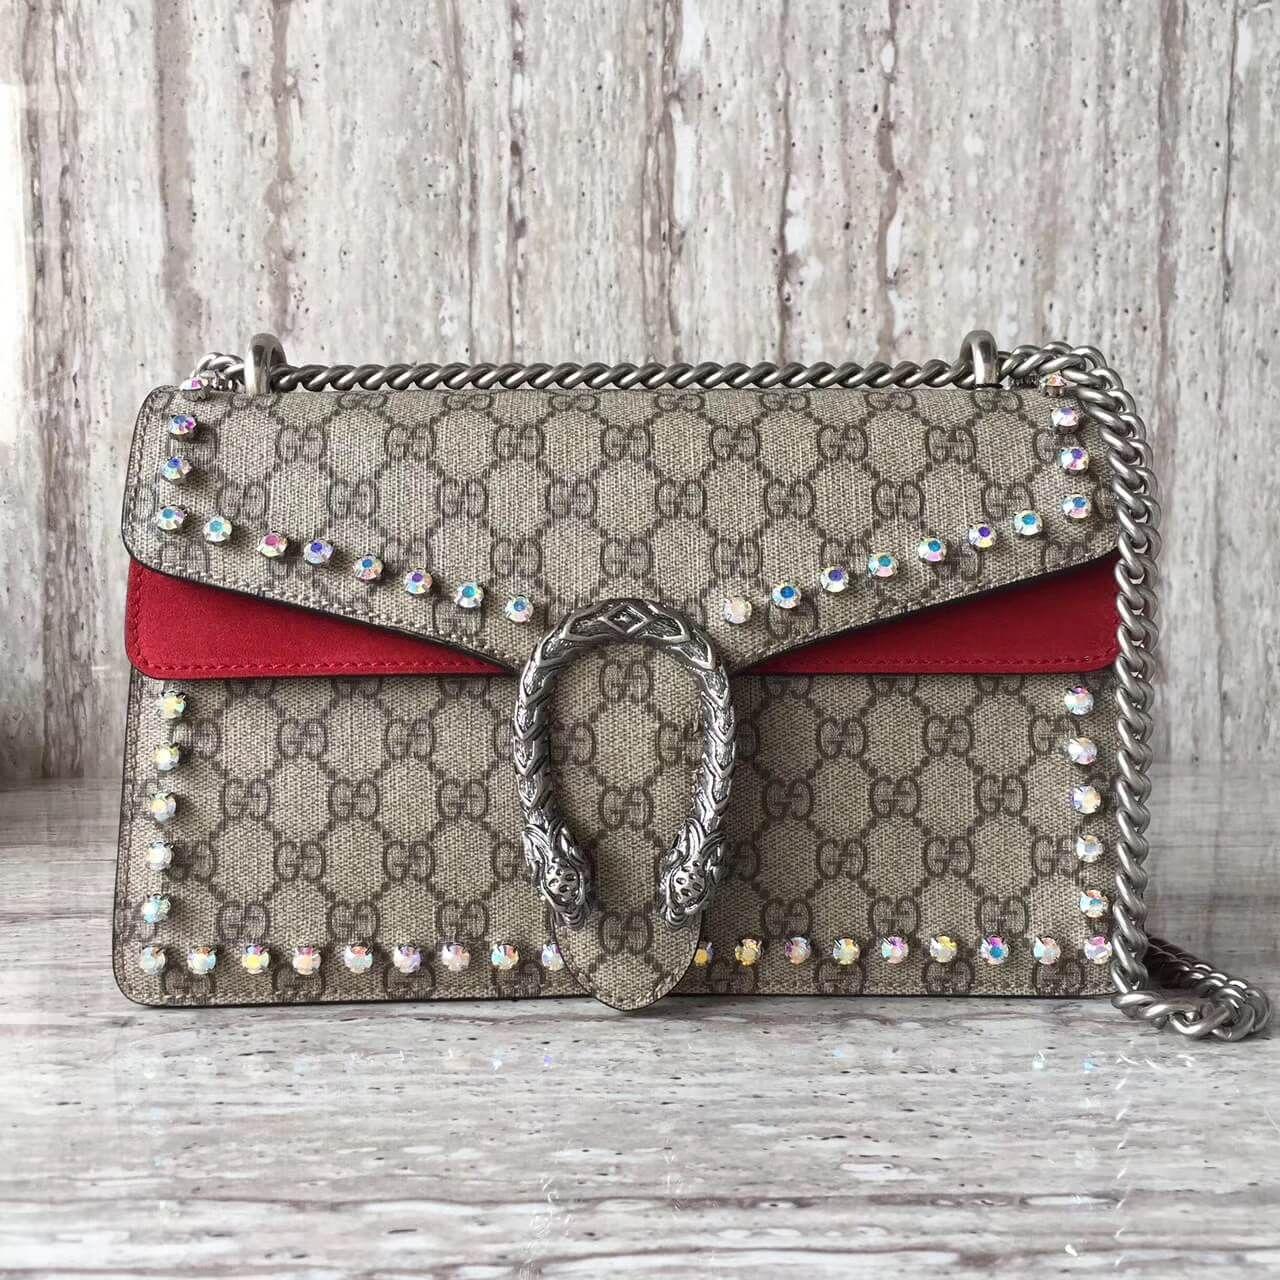 c0c801b74fe Gucci Dionysus GG Supreme Shoulder Bag with Crystals 400249 Red 2017 ...